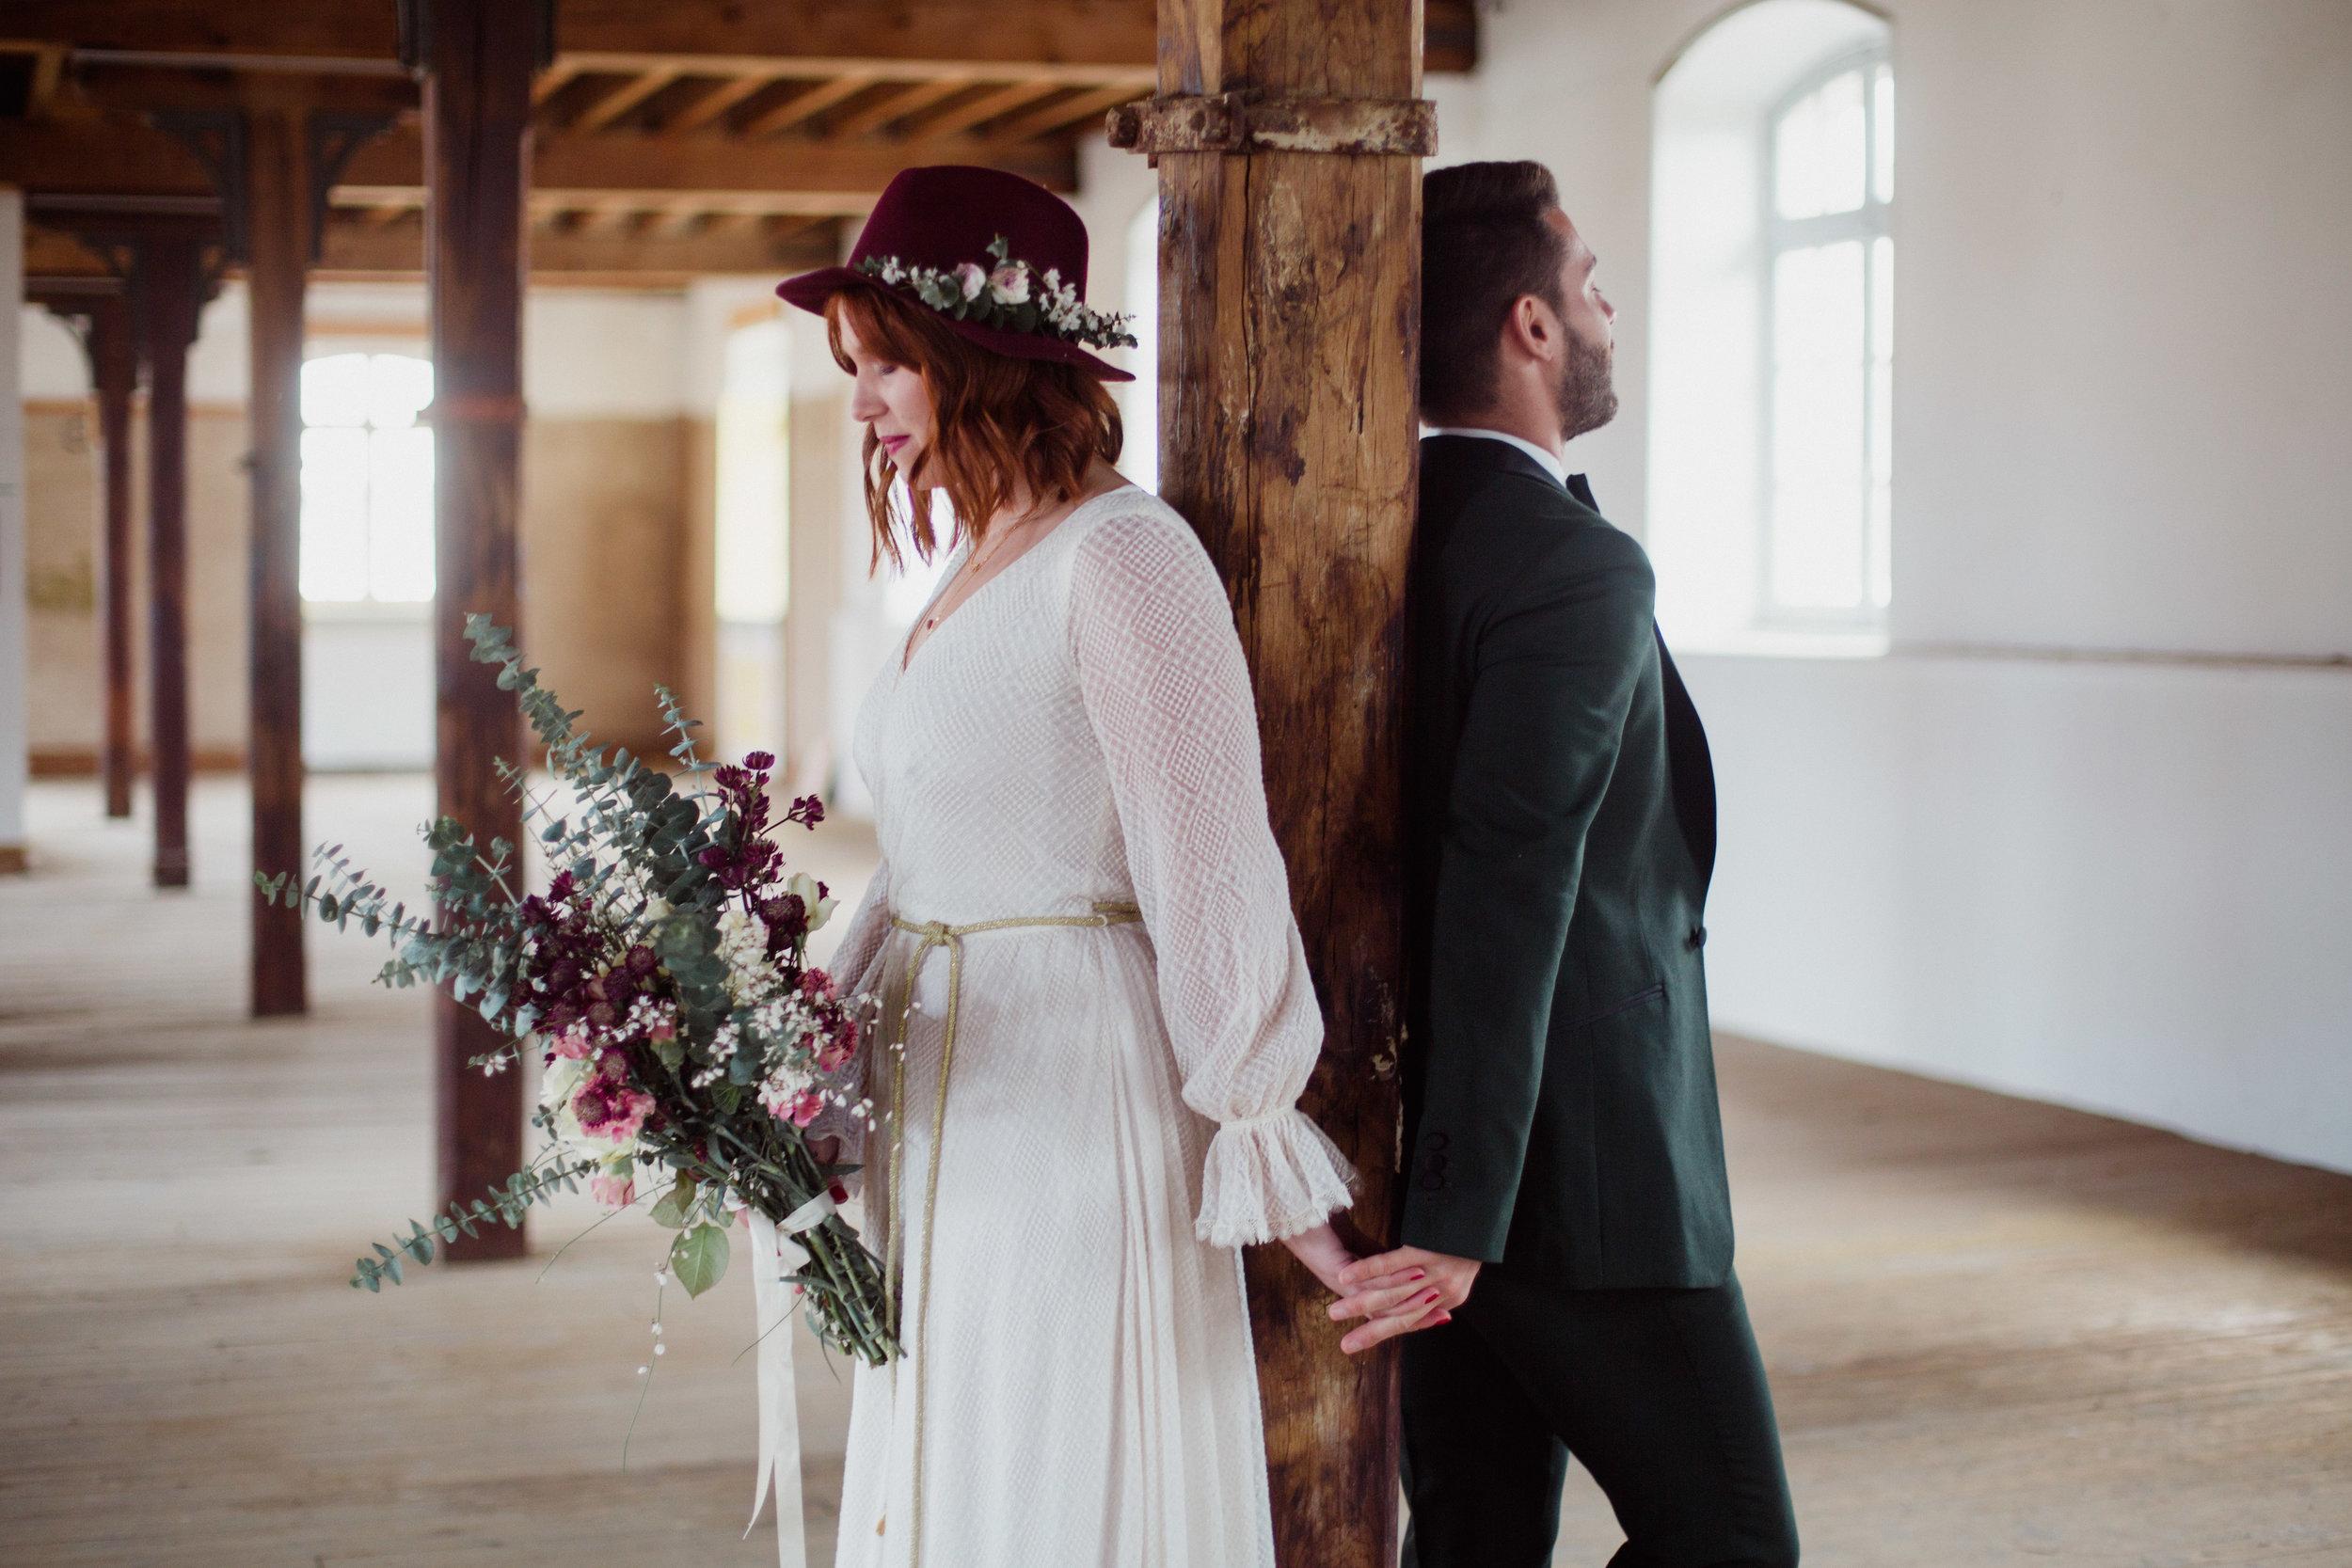 mariage_folk_rock_bordeaux_centre_photographe_dordogne_pauline_maroussia_robes_mariages_wednesday_atelier